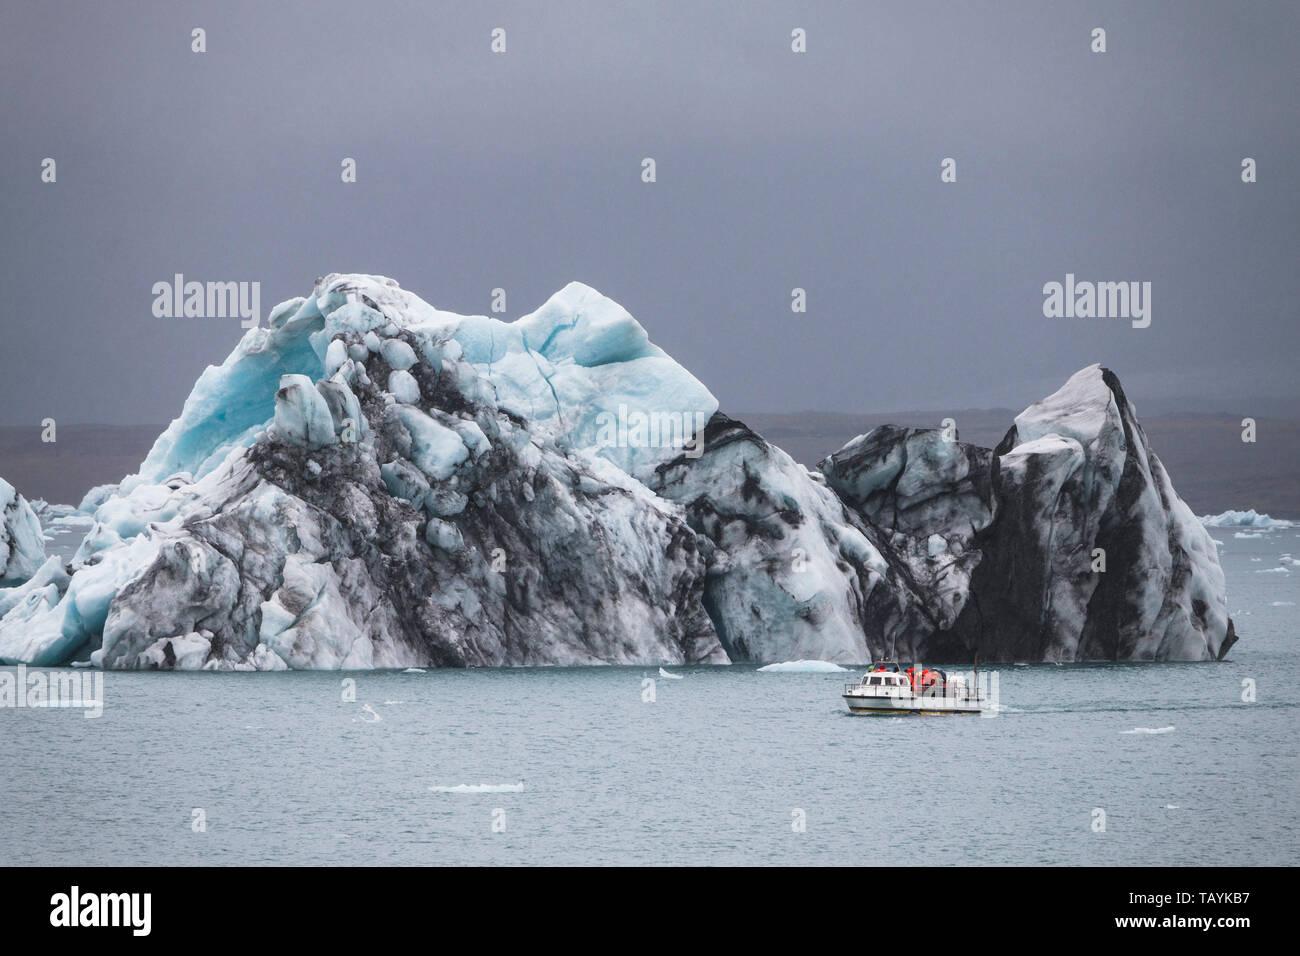 Huge iceberg and resque boat in Iceland Jokulsarlon Stock Photo